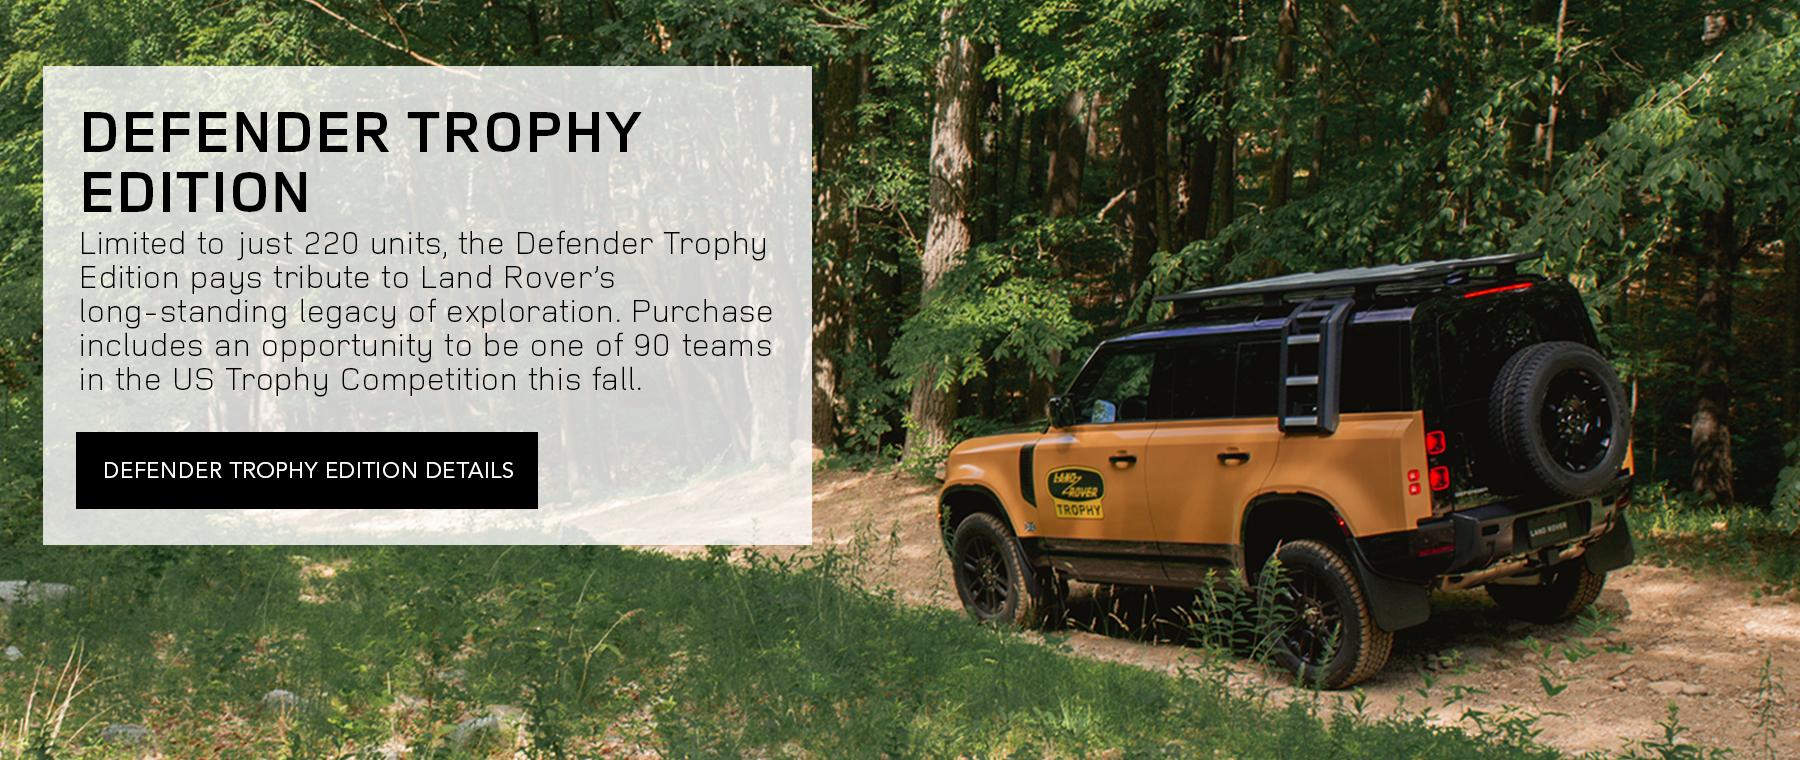 LR Defender Limited Trophy Edition DI Large 1800×760